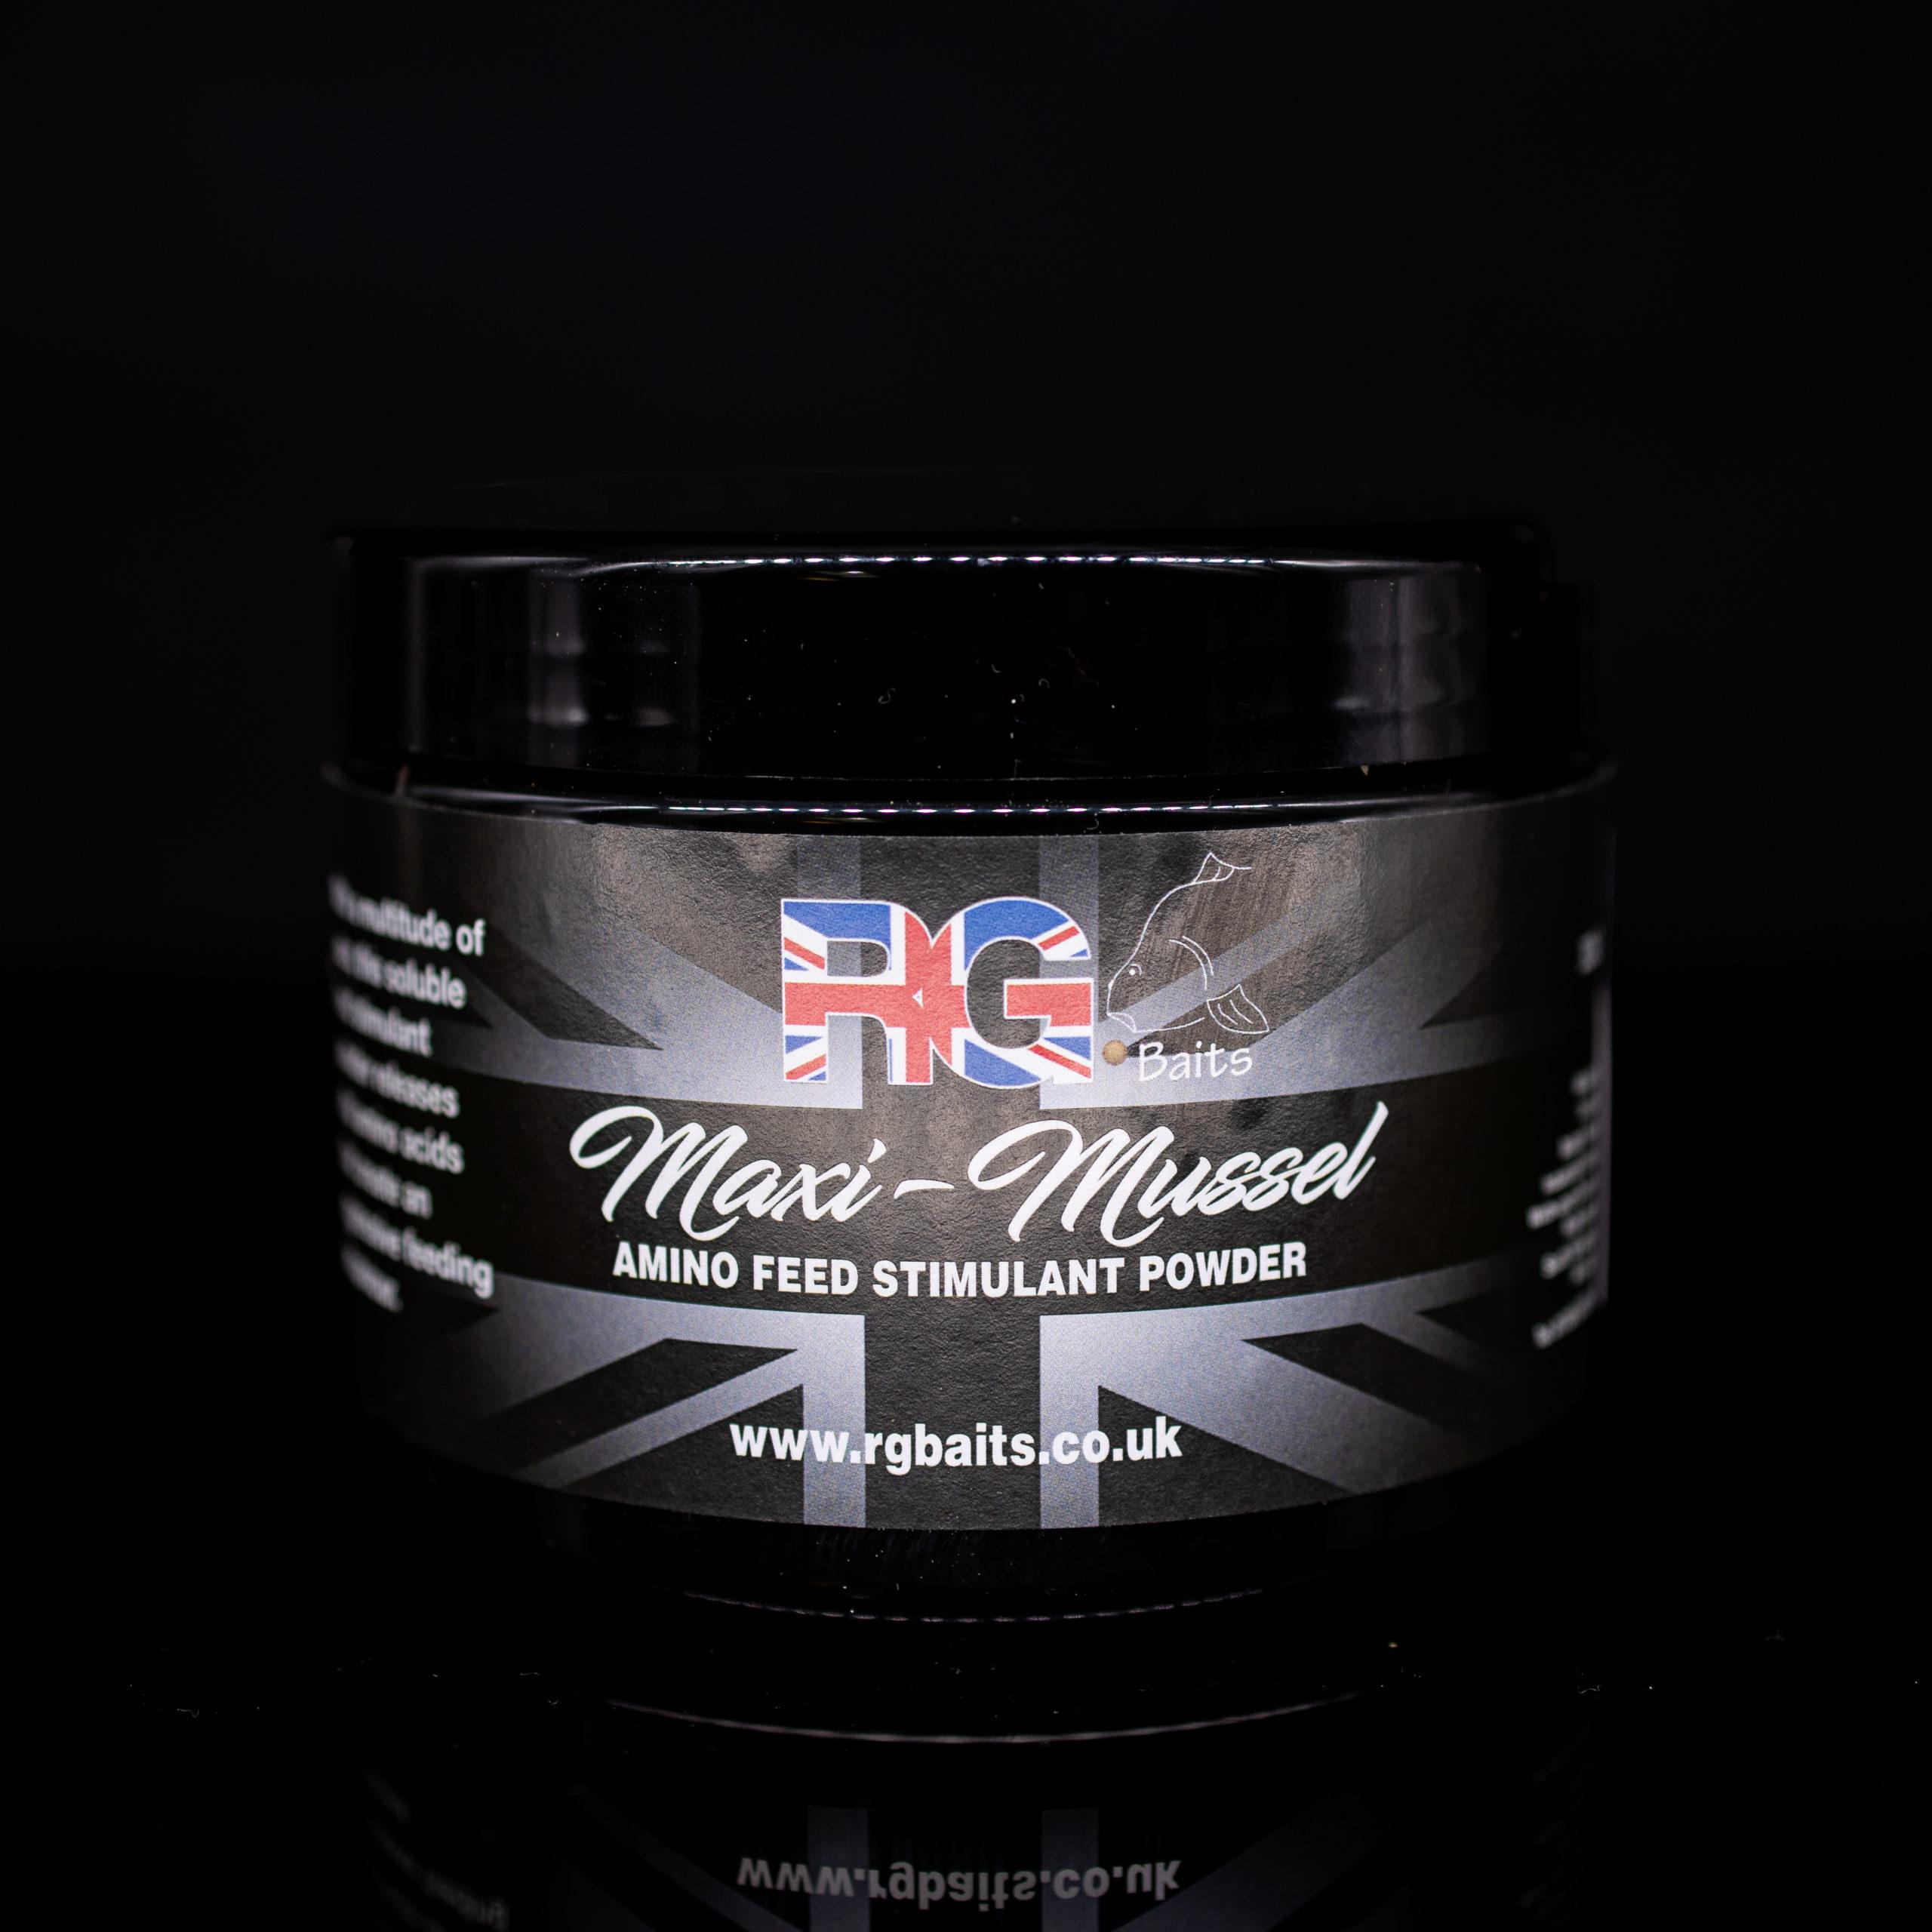 Maxi-Mussel Amino Feed Stimulant Powder – 300g